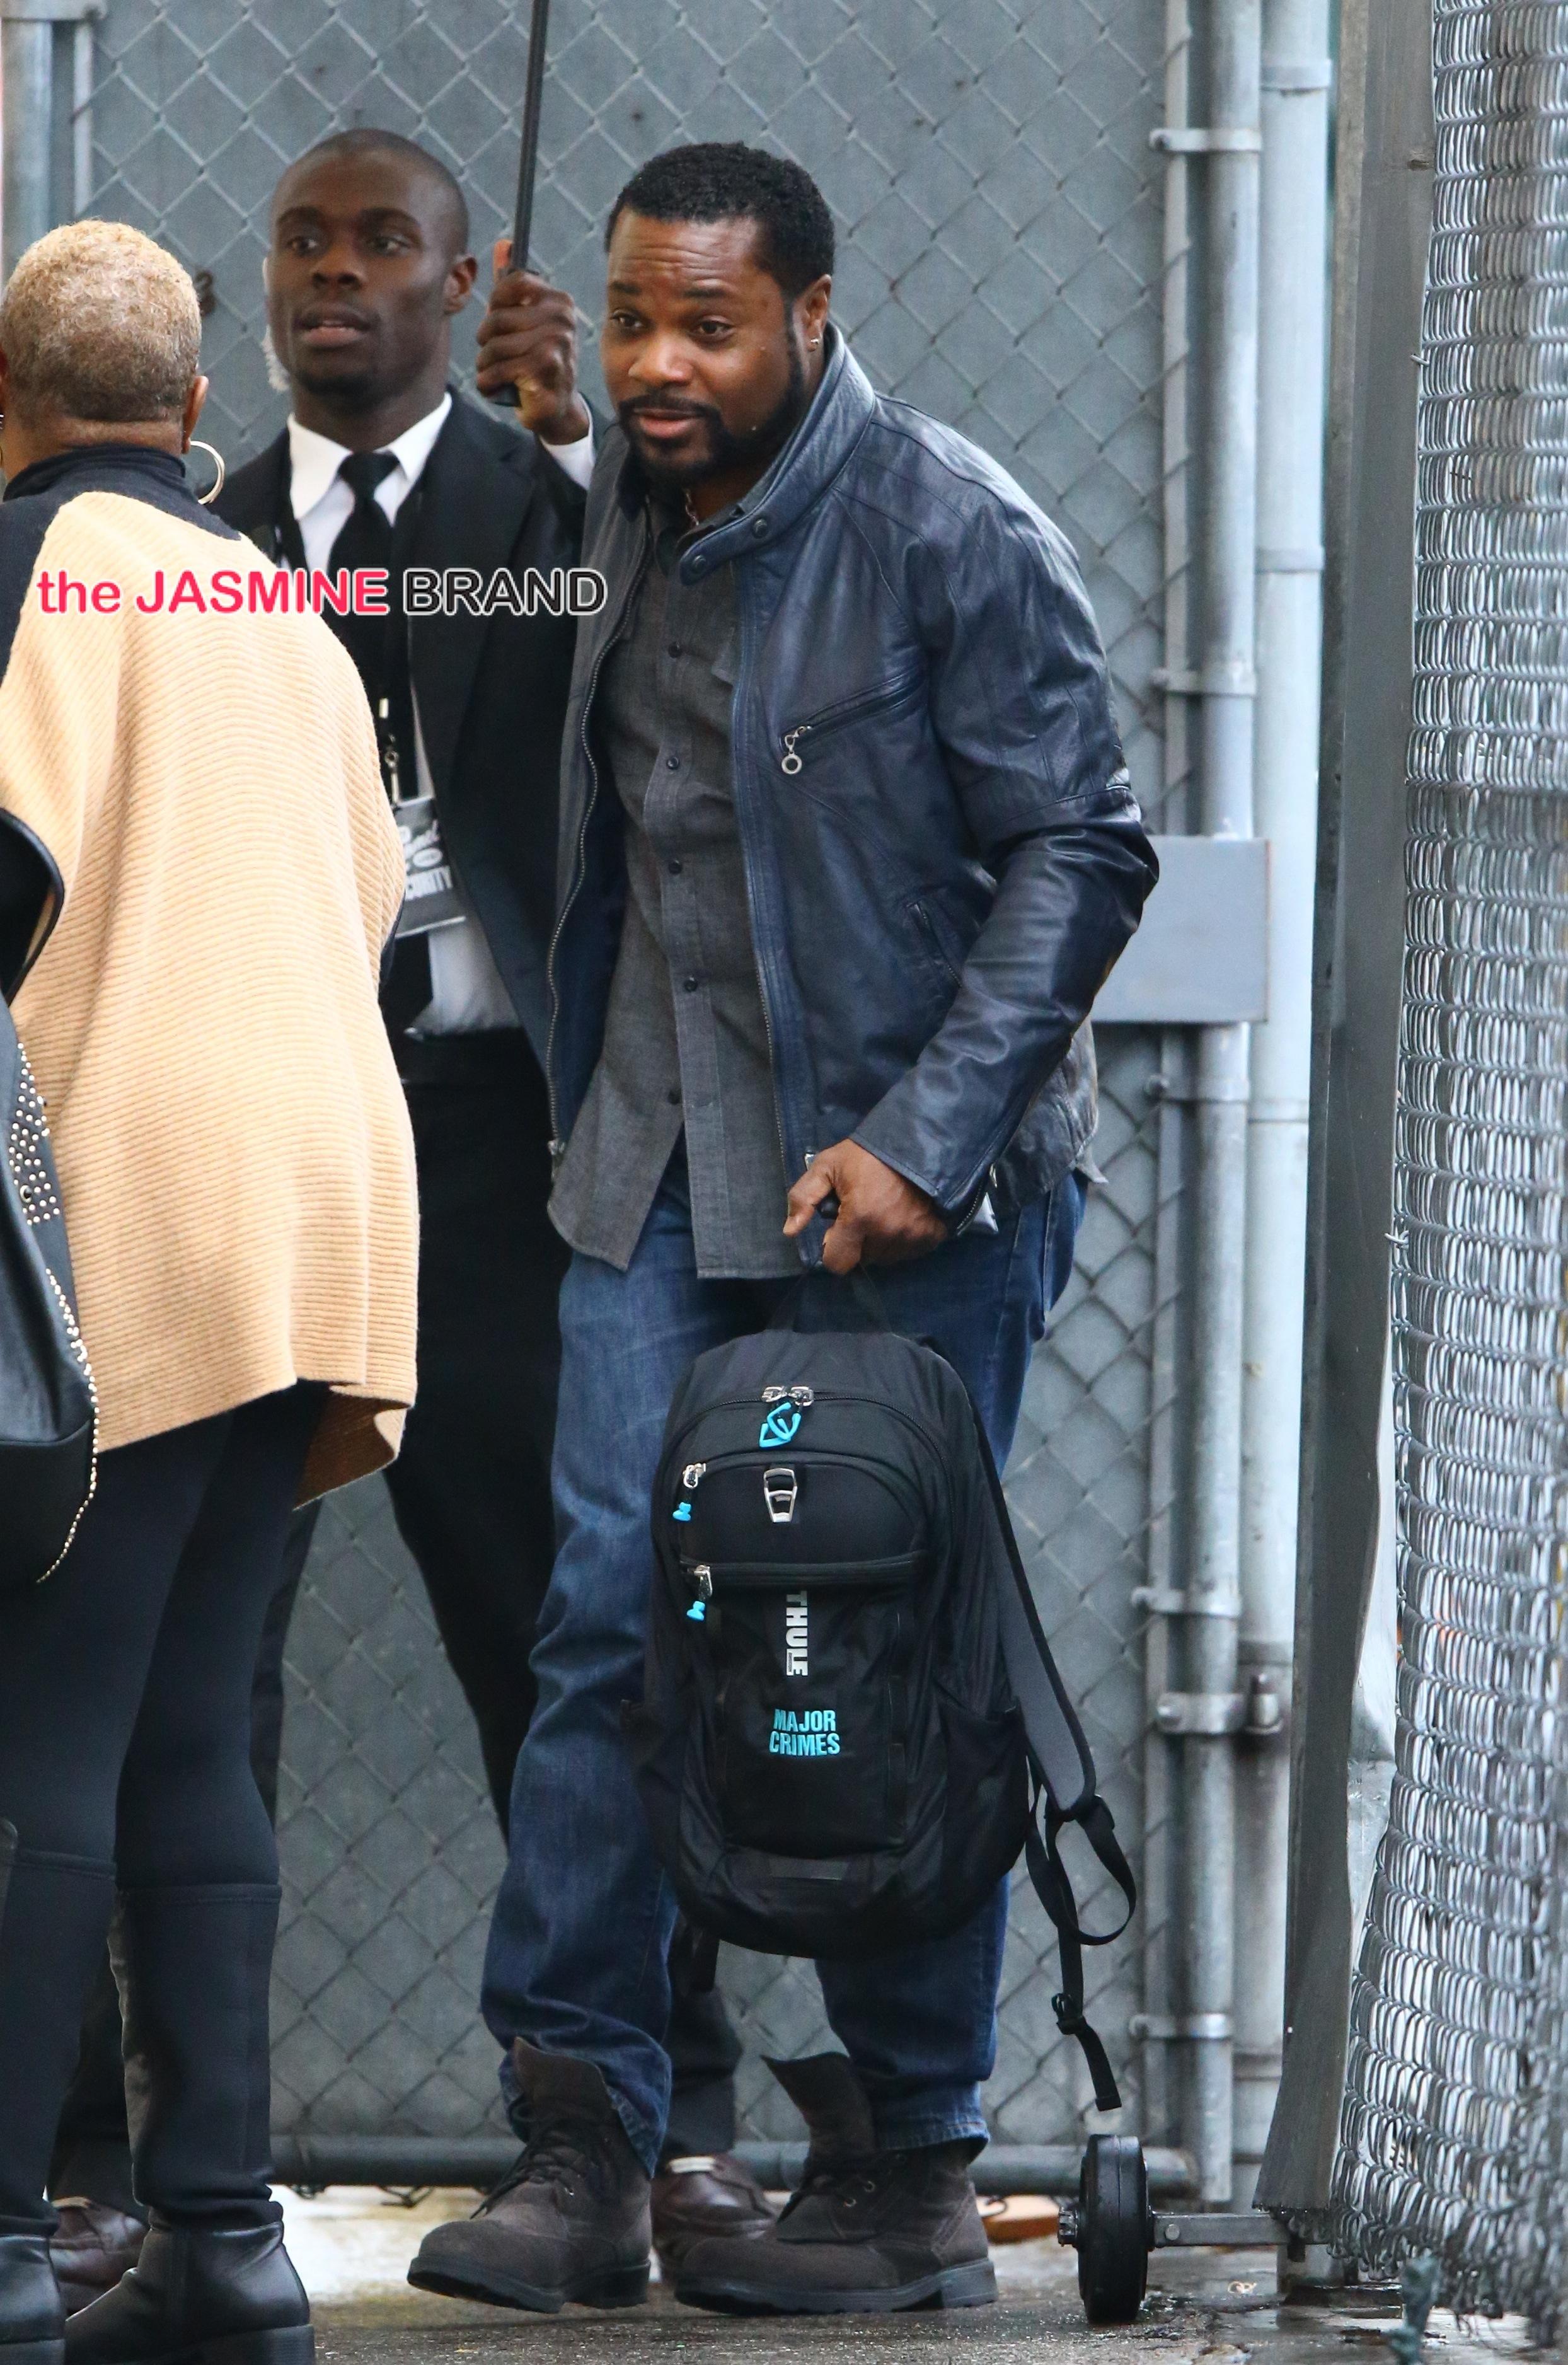 Malcolm-Jamal Warner seen at 'Jimmy Kimmel Live!'